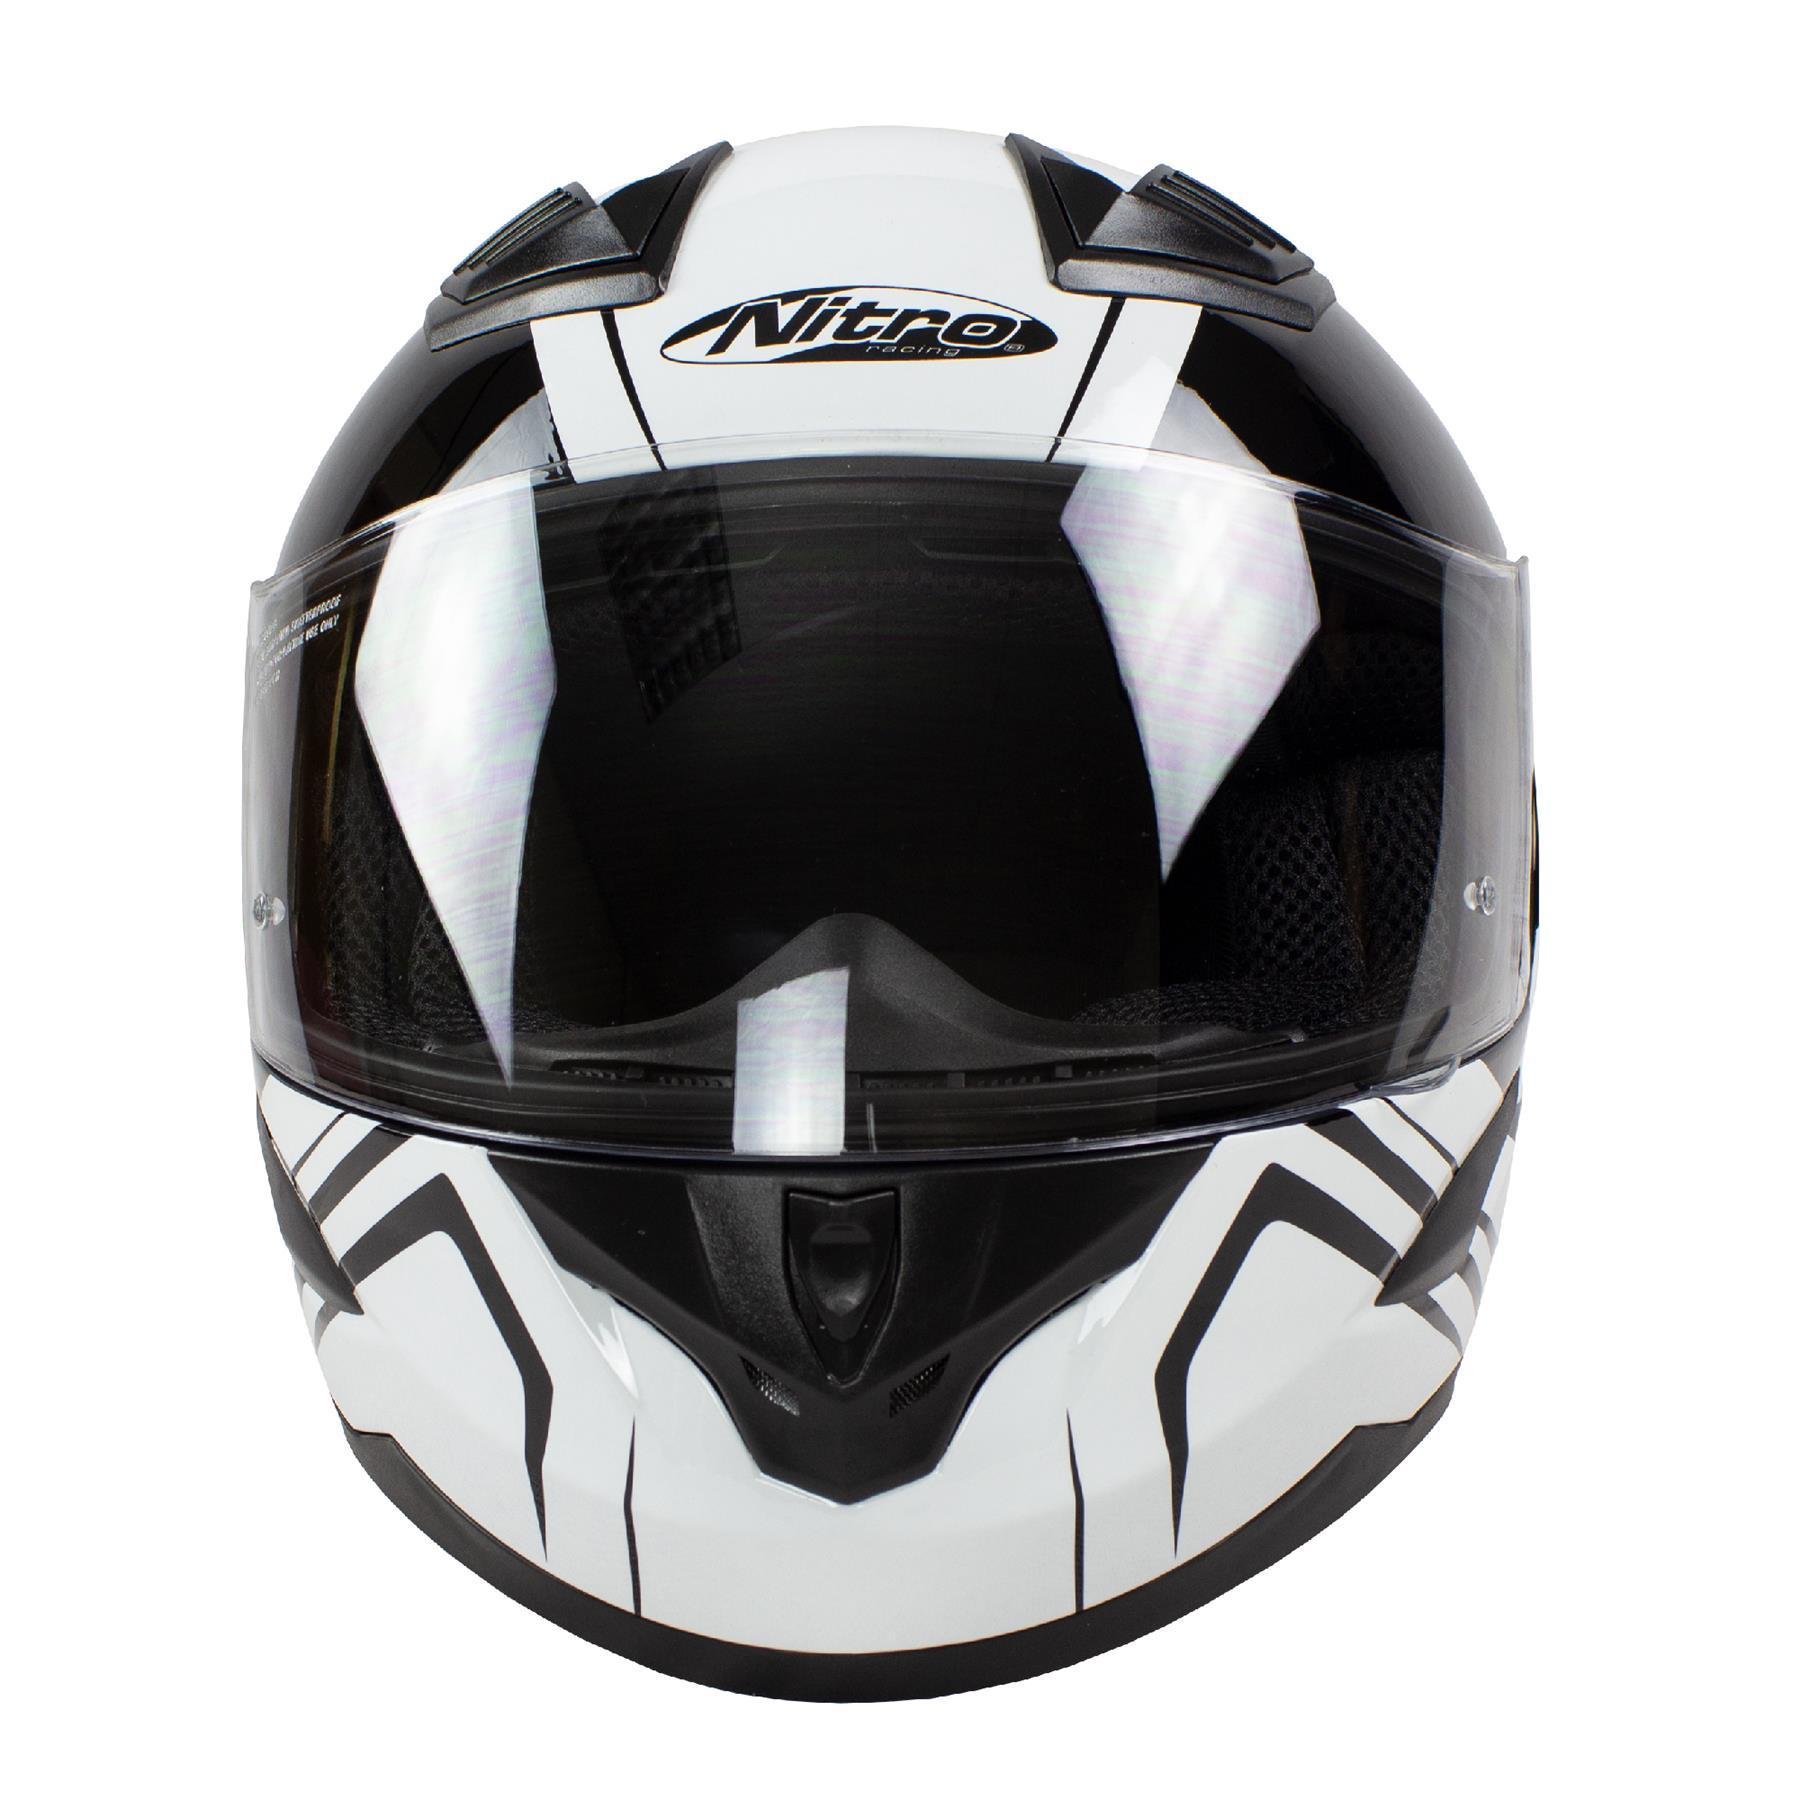 Nitro-N2400-Rogue-Full-Face-Motorcycle-Motorbike-Crash-Helmet-Black-Blue-Red thumbnail 28